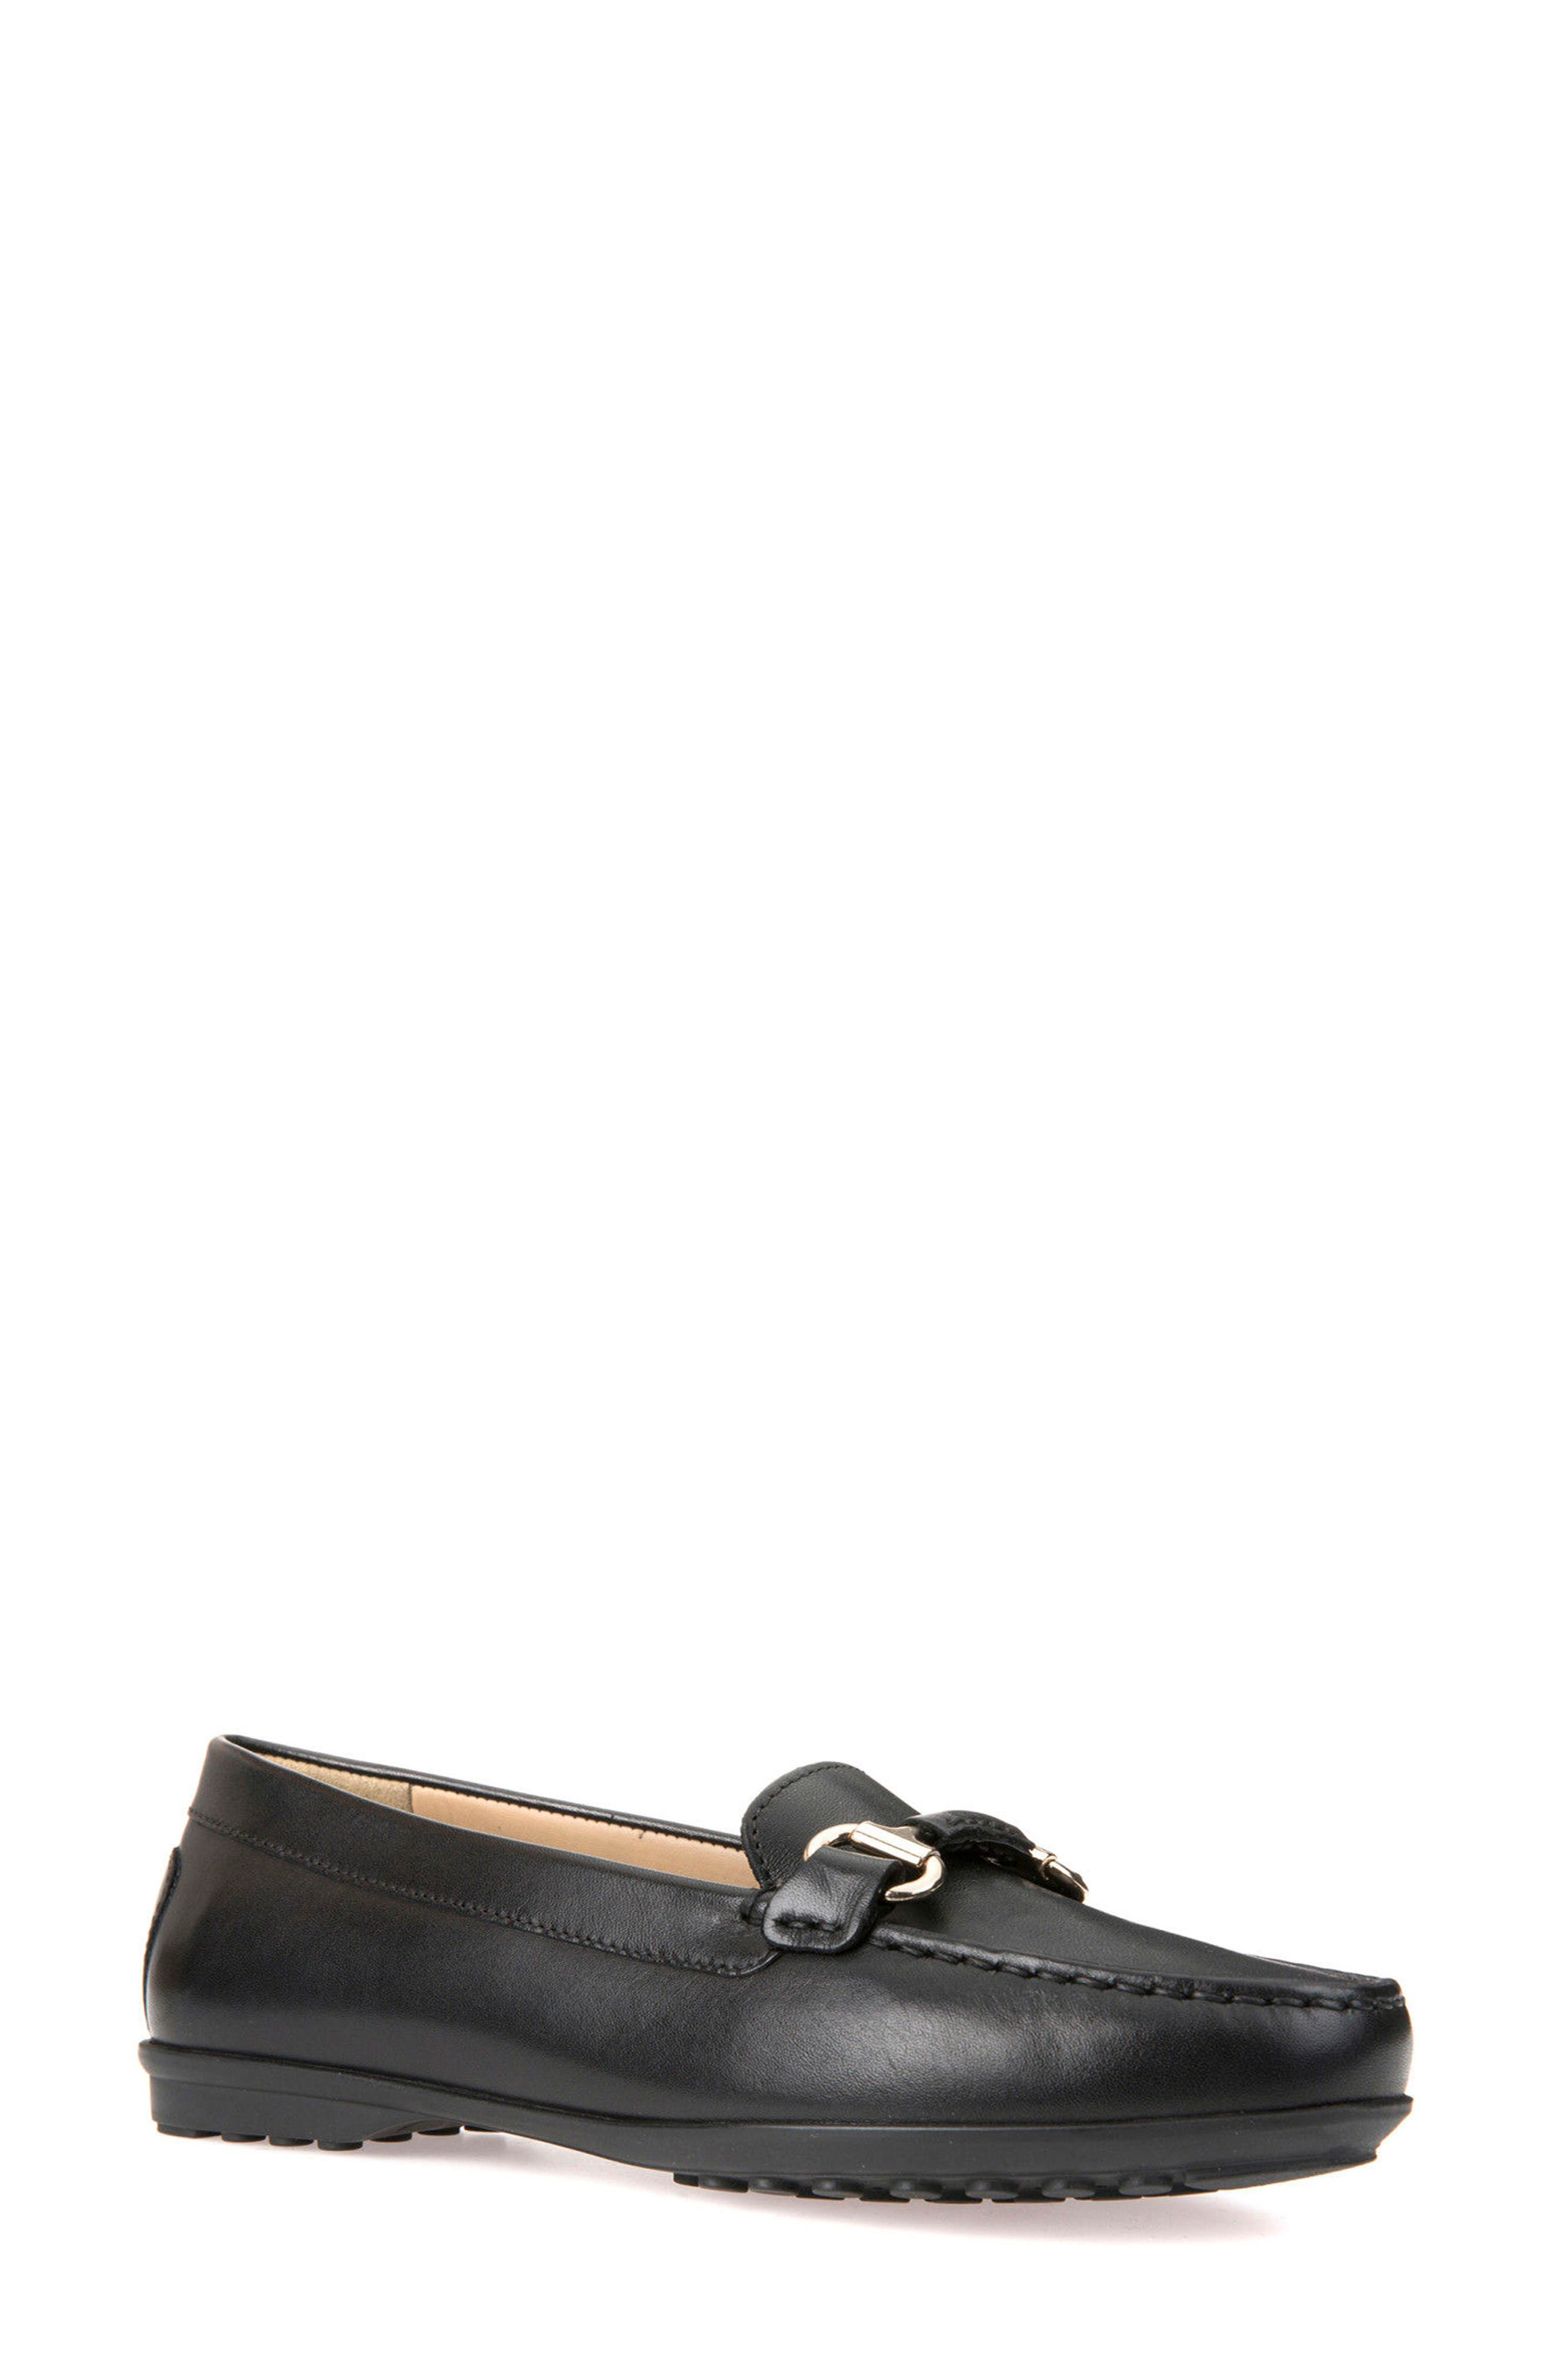 Elidia Buckle Loafer,                         Main,                         color, Black Leather